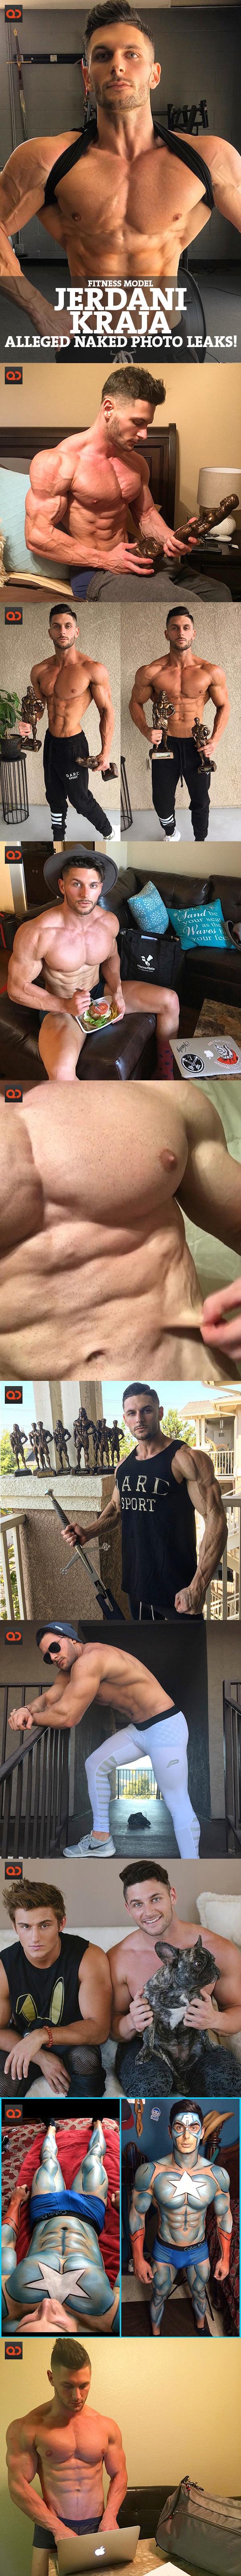 Fitness Model Jerdani Kraja Alleged Naked Photo Leaks!